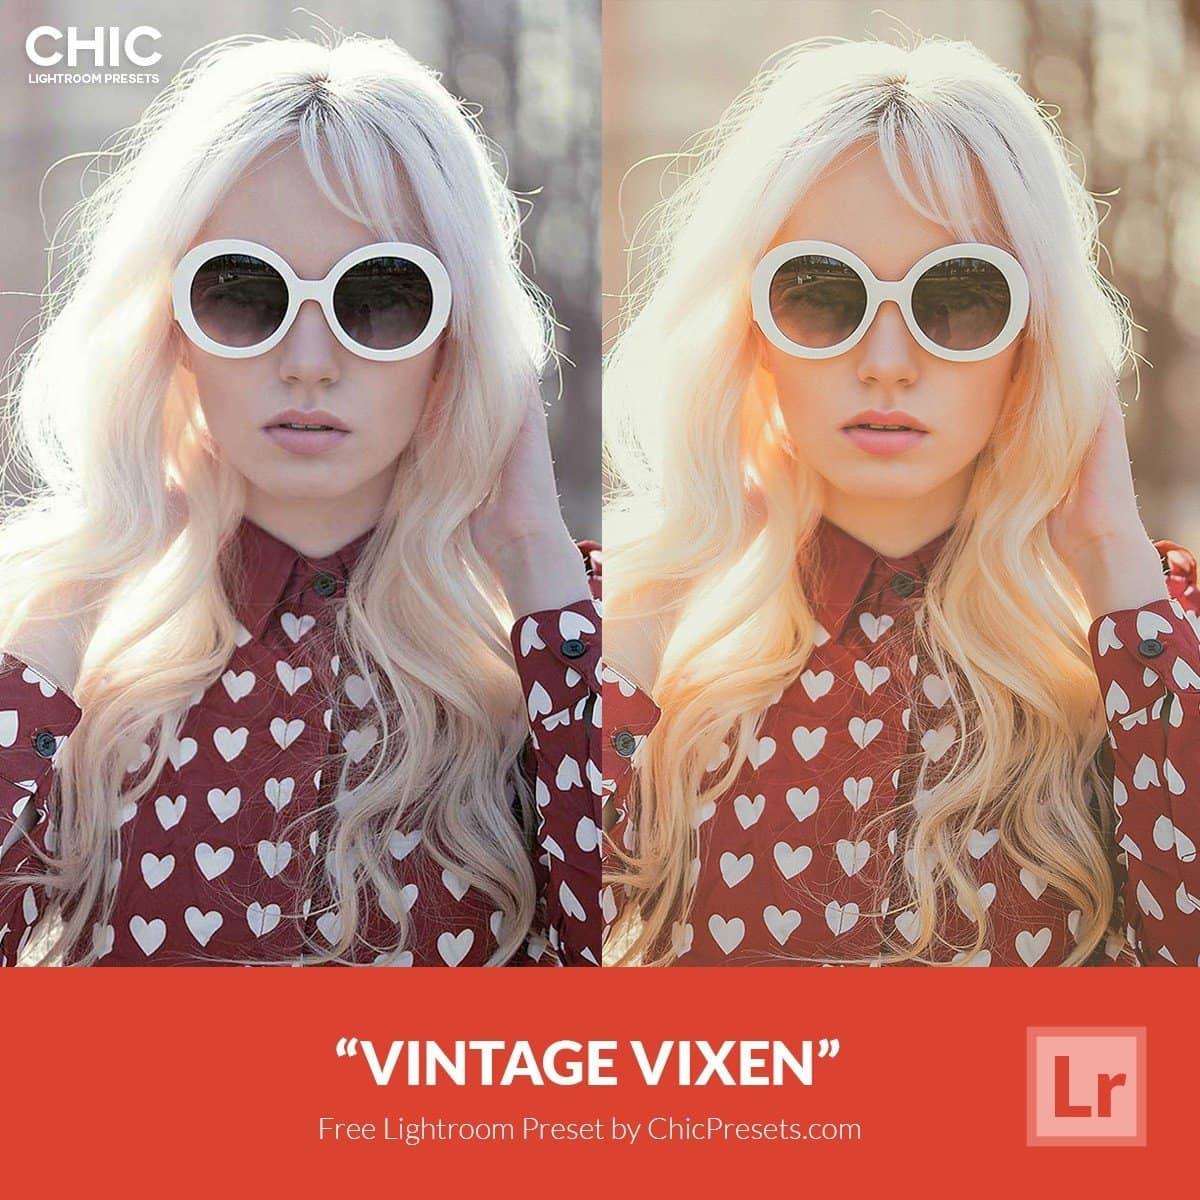 Free-Lightroom-Preset-Vintage-Vixen-Chicpresets.com